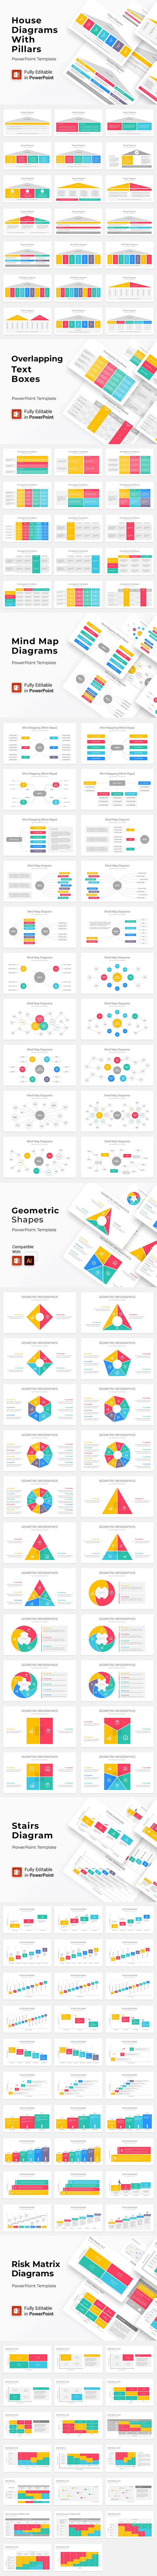 Slide Deck - Multipurpose PowerPoint Template - 9